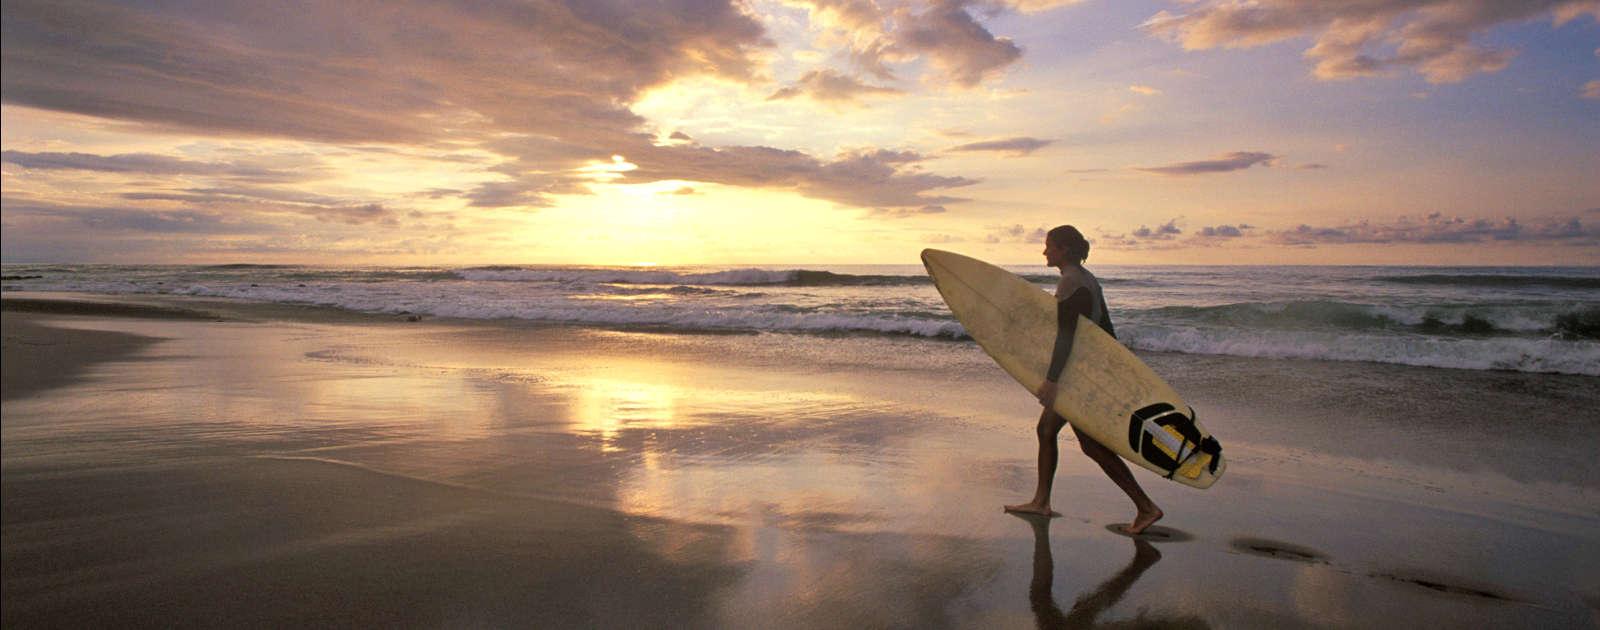 delphi-surfing